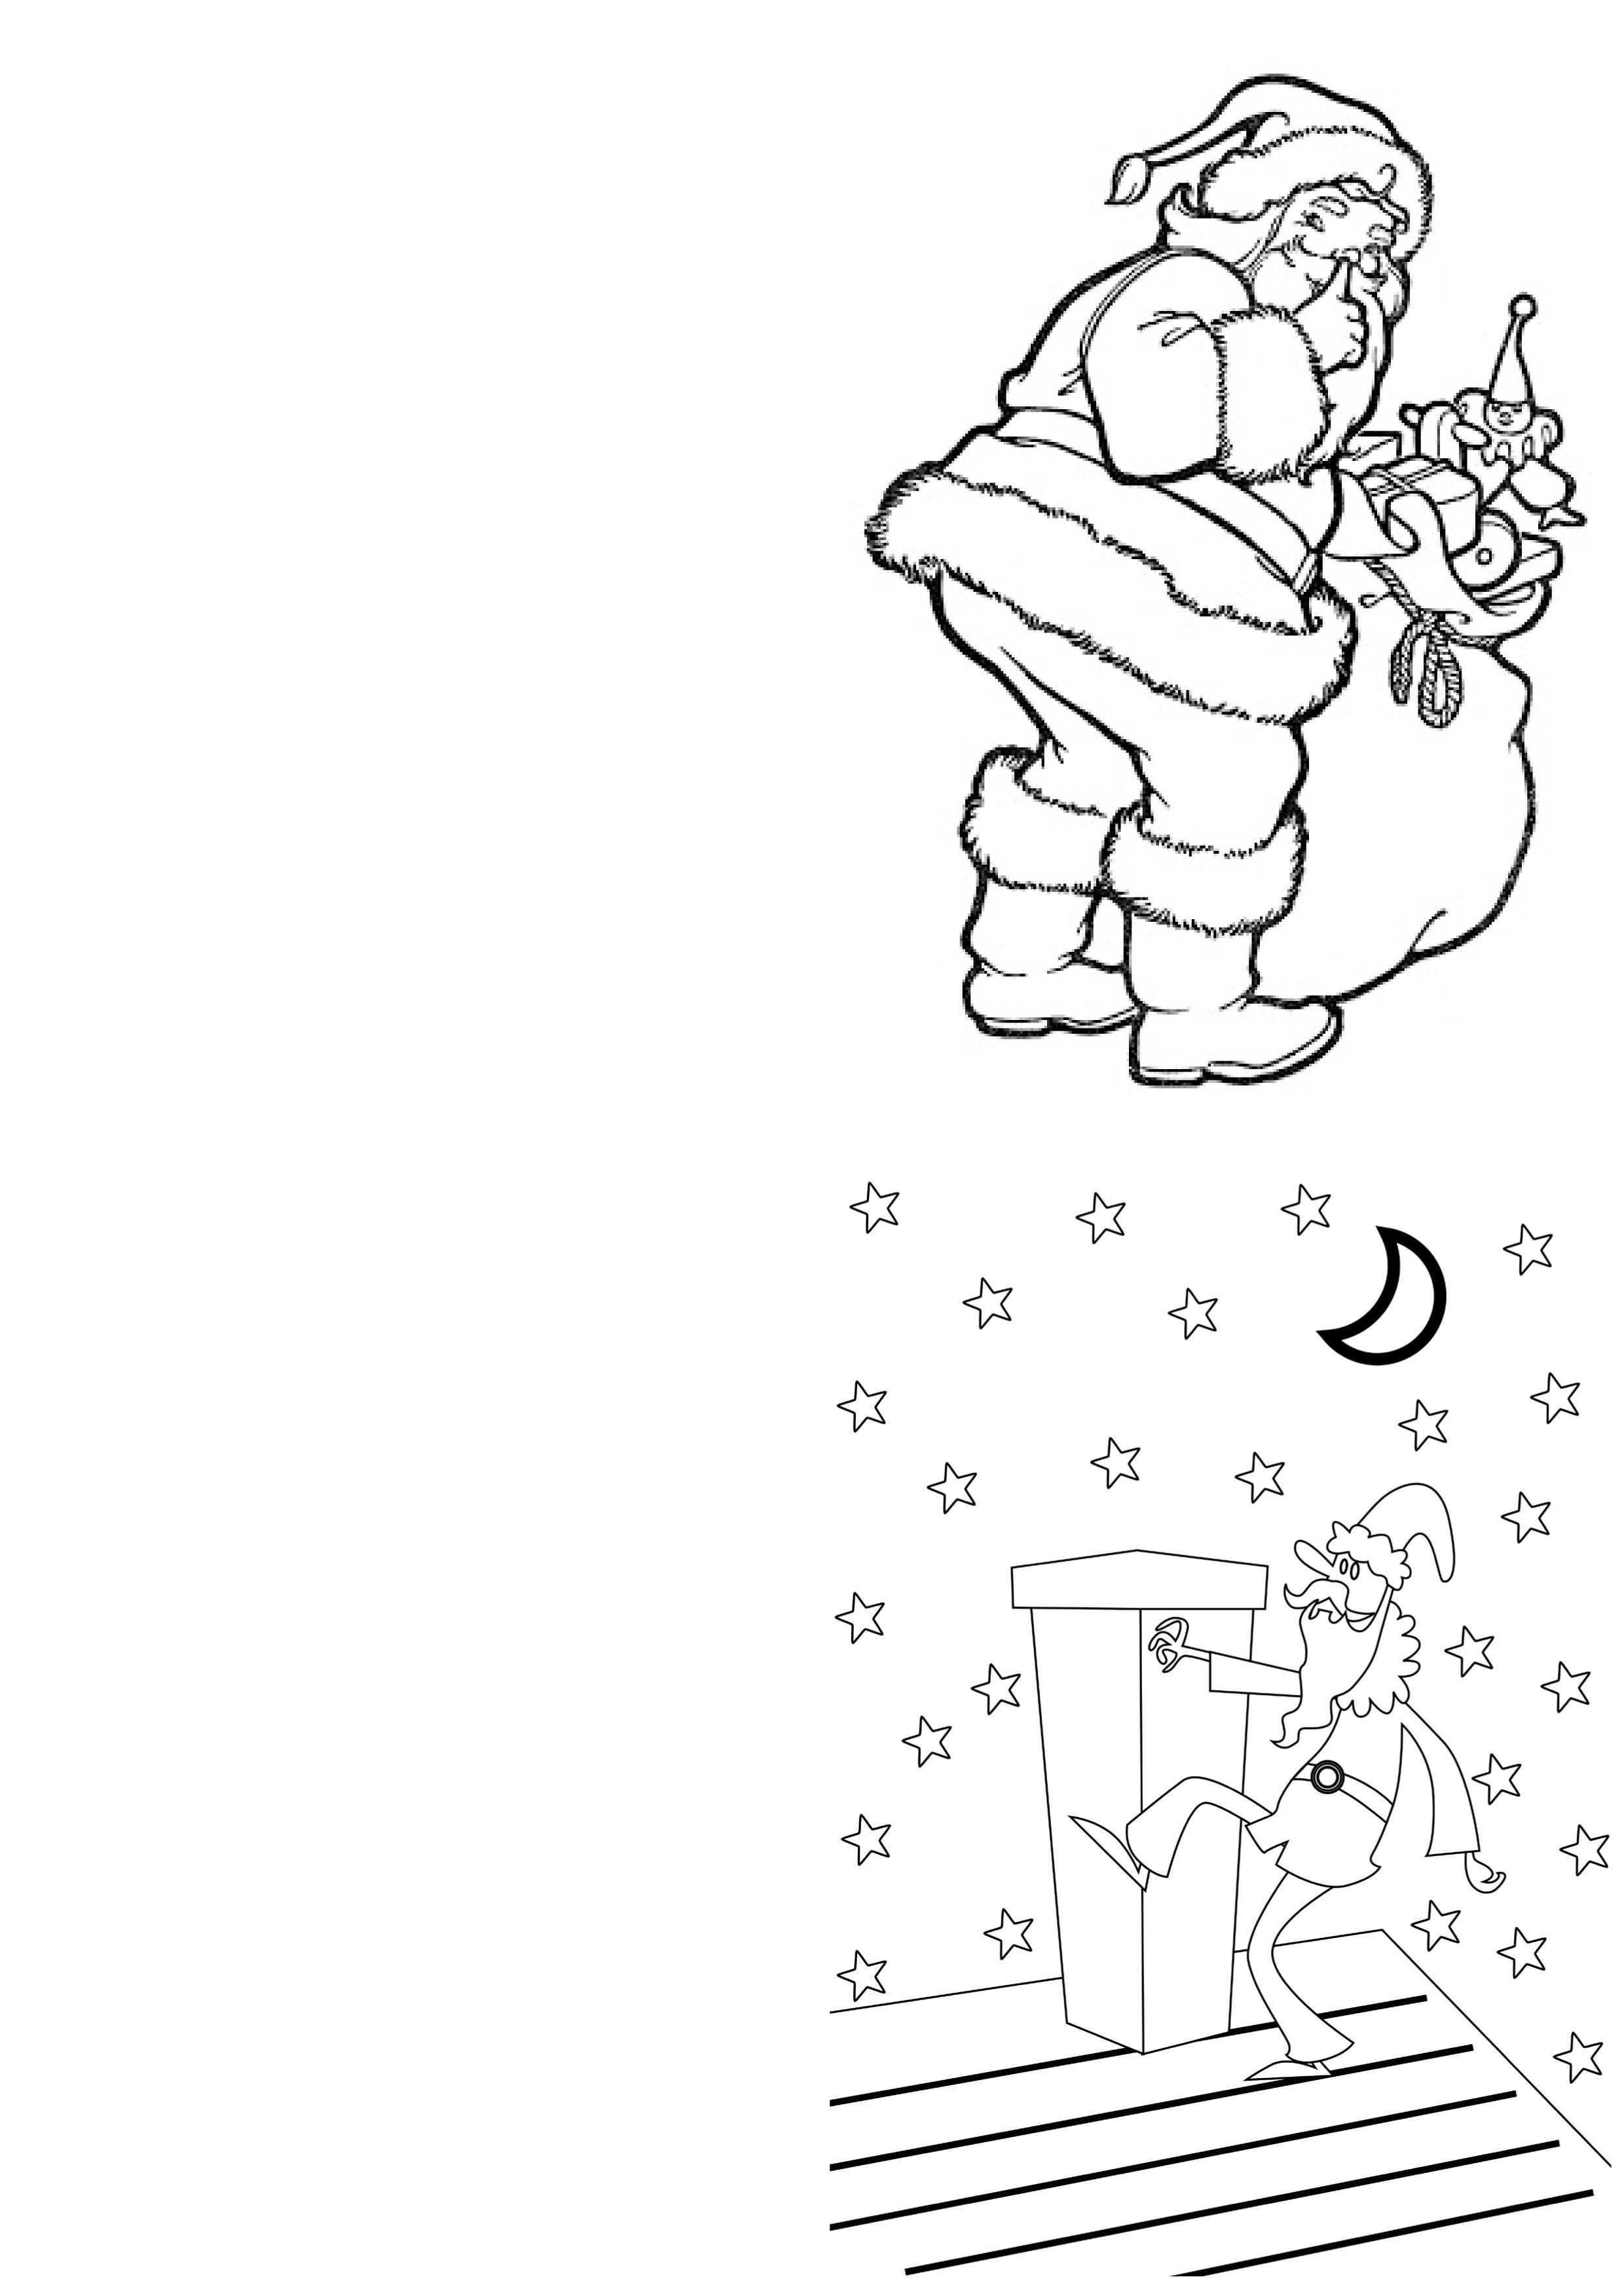 A Range Of Free Printable Christmas Cards Designs For Children To - Free Printable Christmas Cards To Color